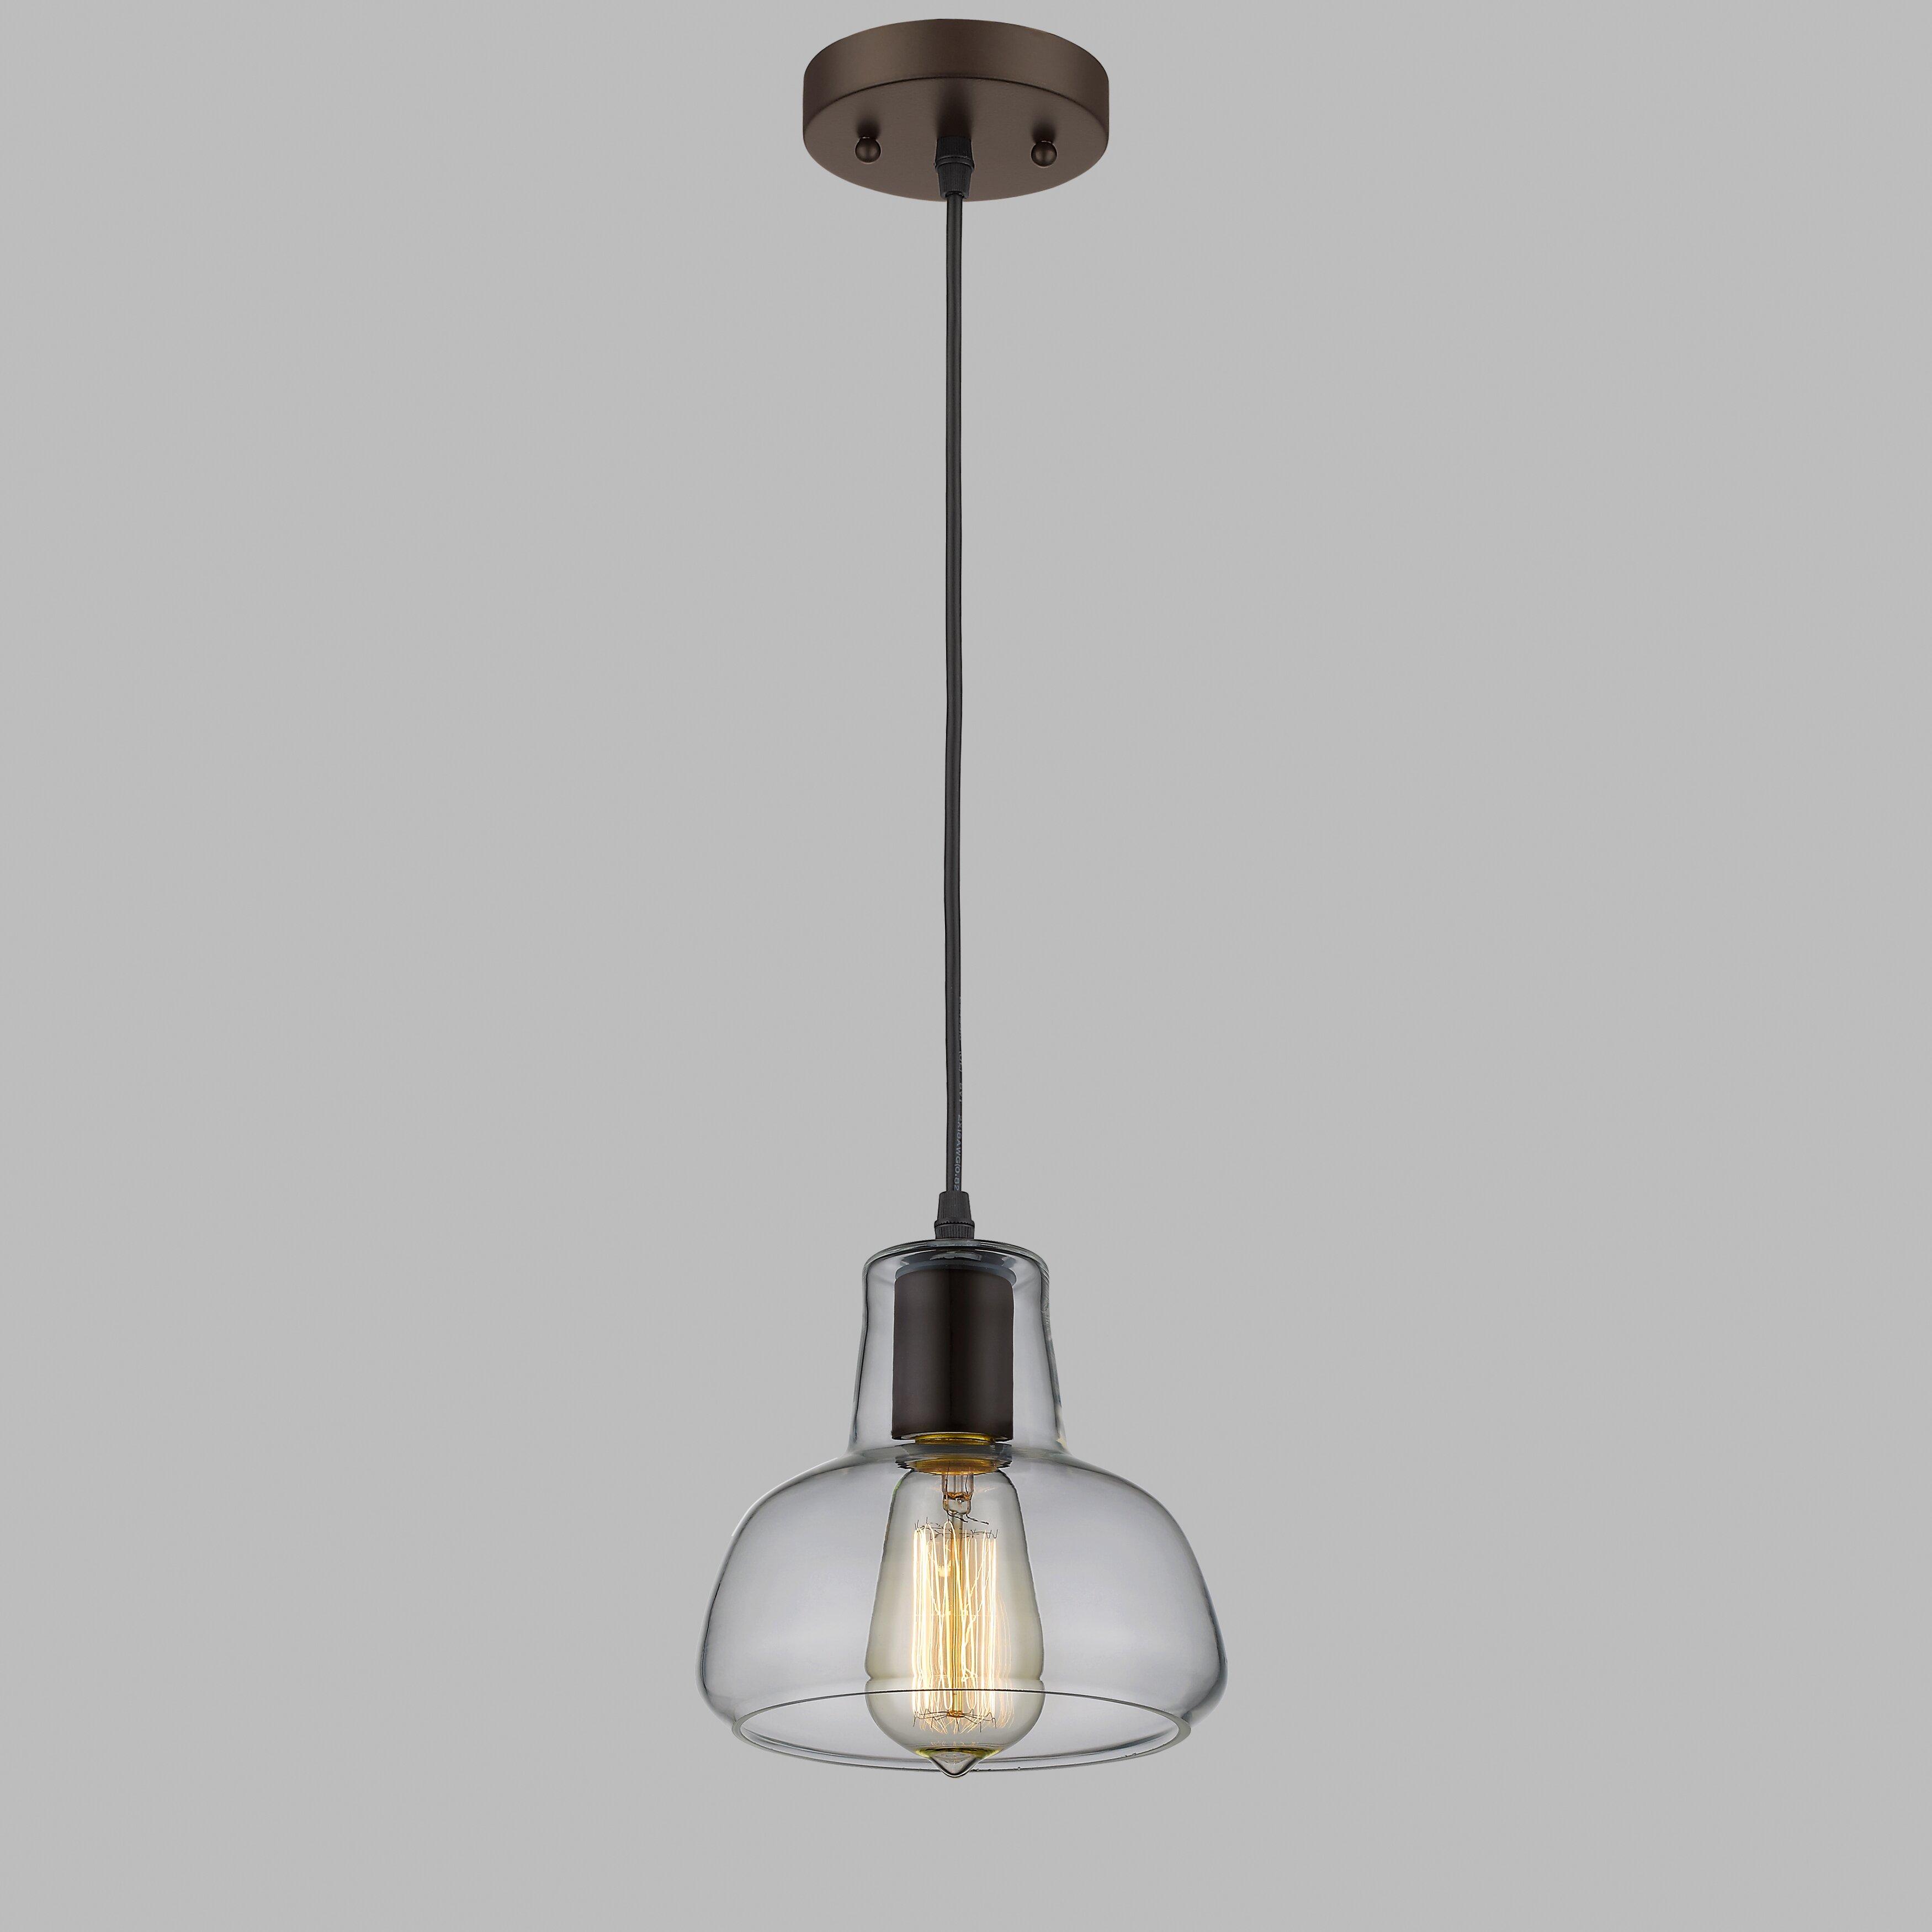 Laurel Foundry Modern Farmhouse Bouvet 1 Light Mini Pendant & Reviews